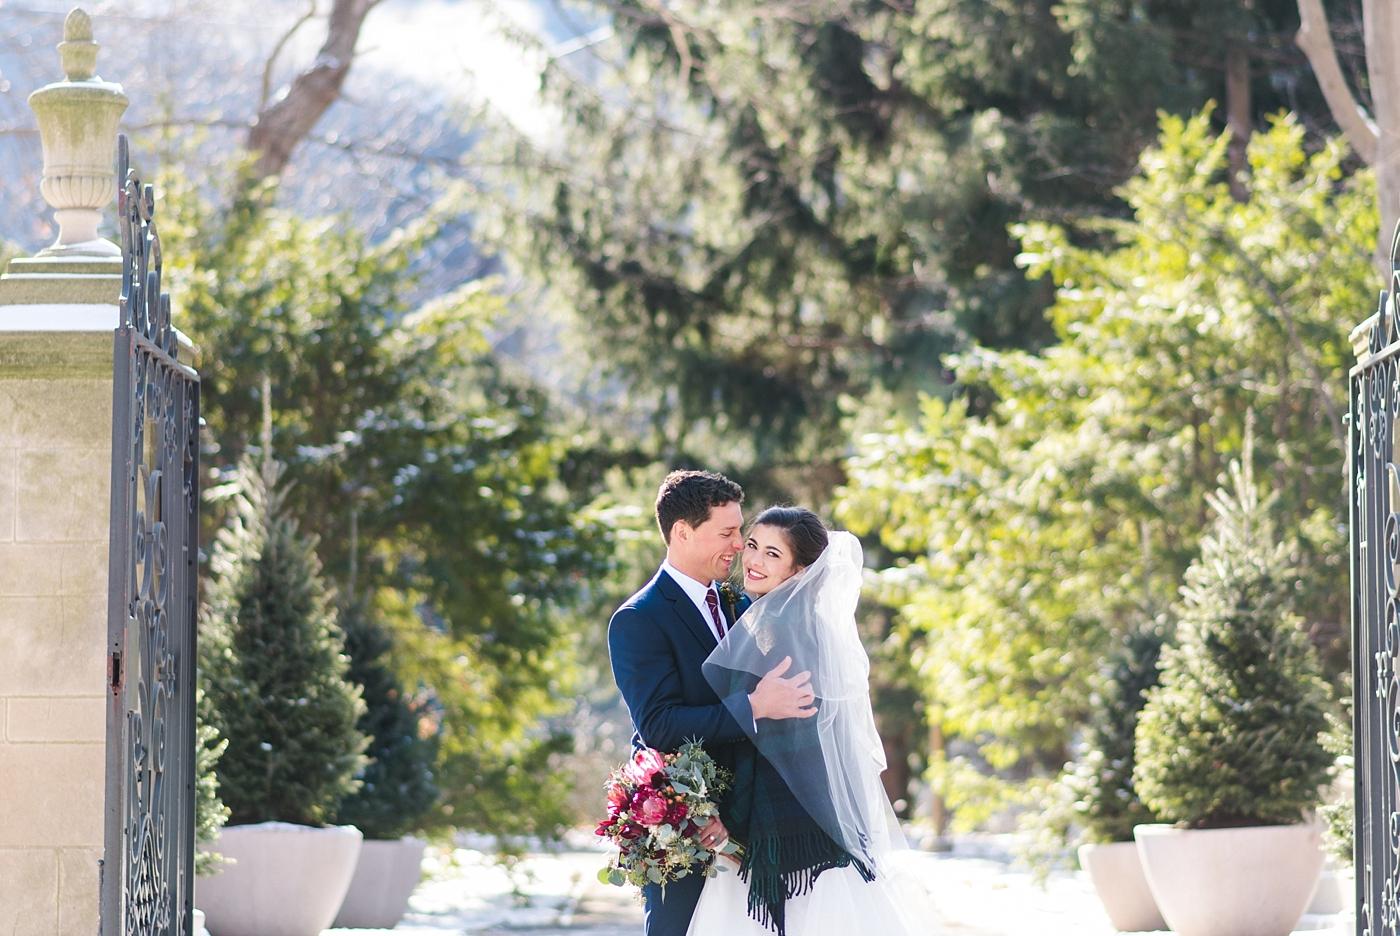 indianapolis-top-rated-wedding-photographers_0431.jpg